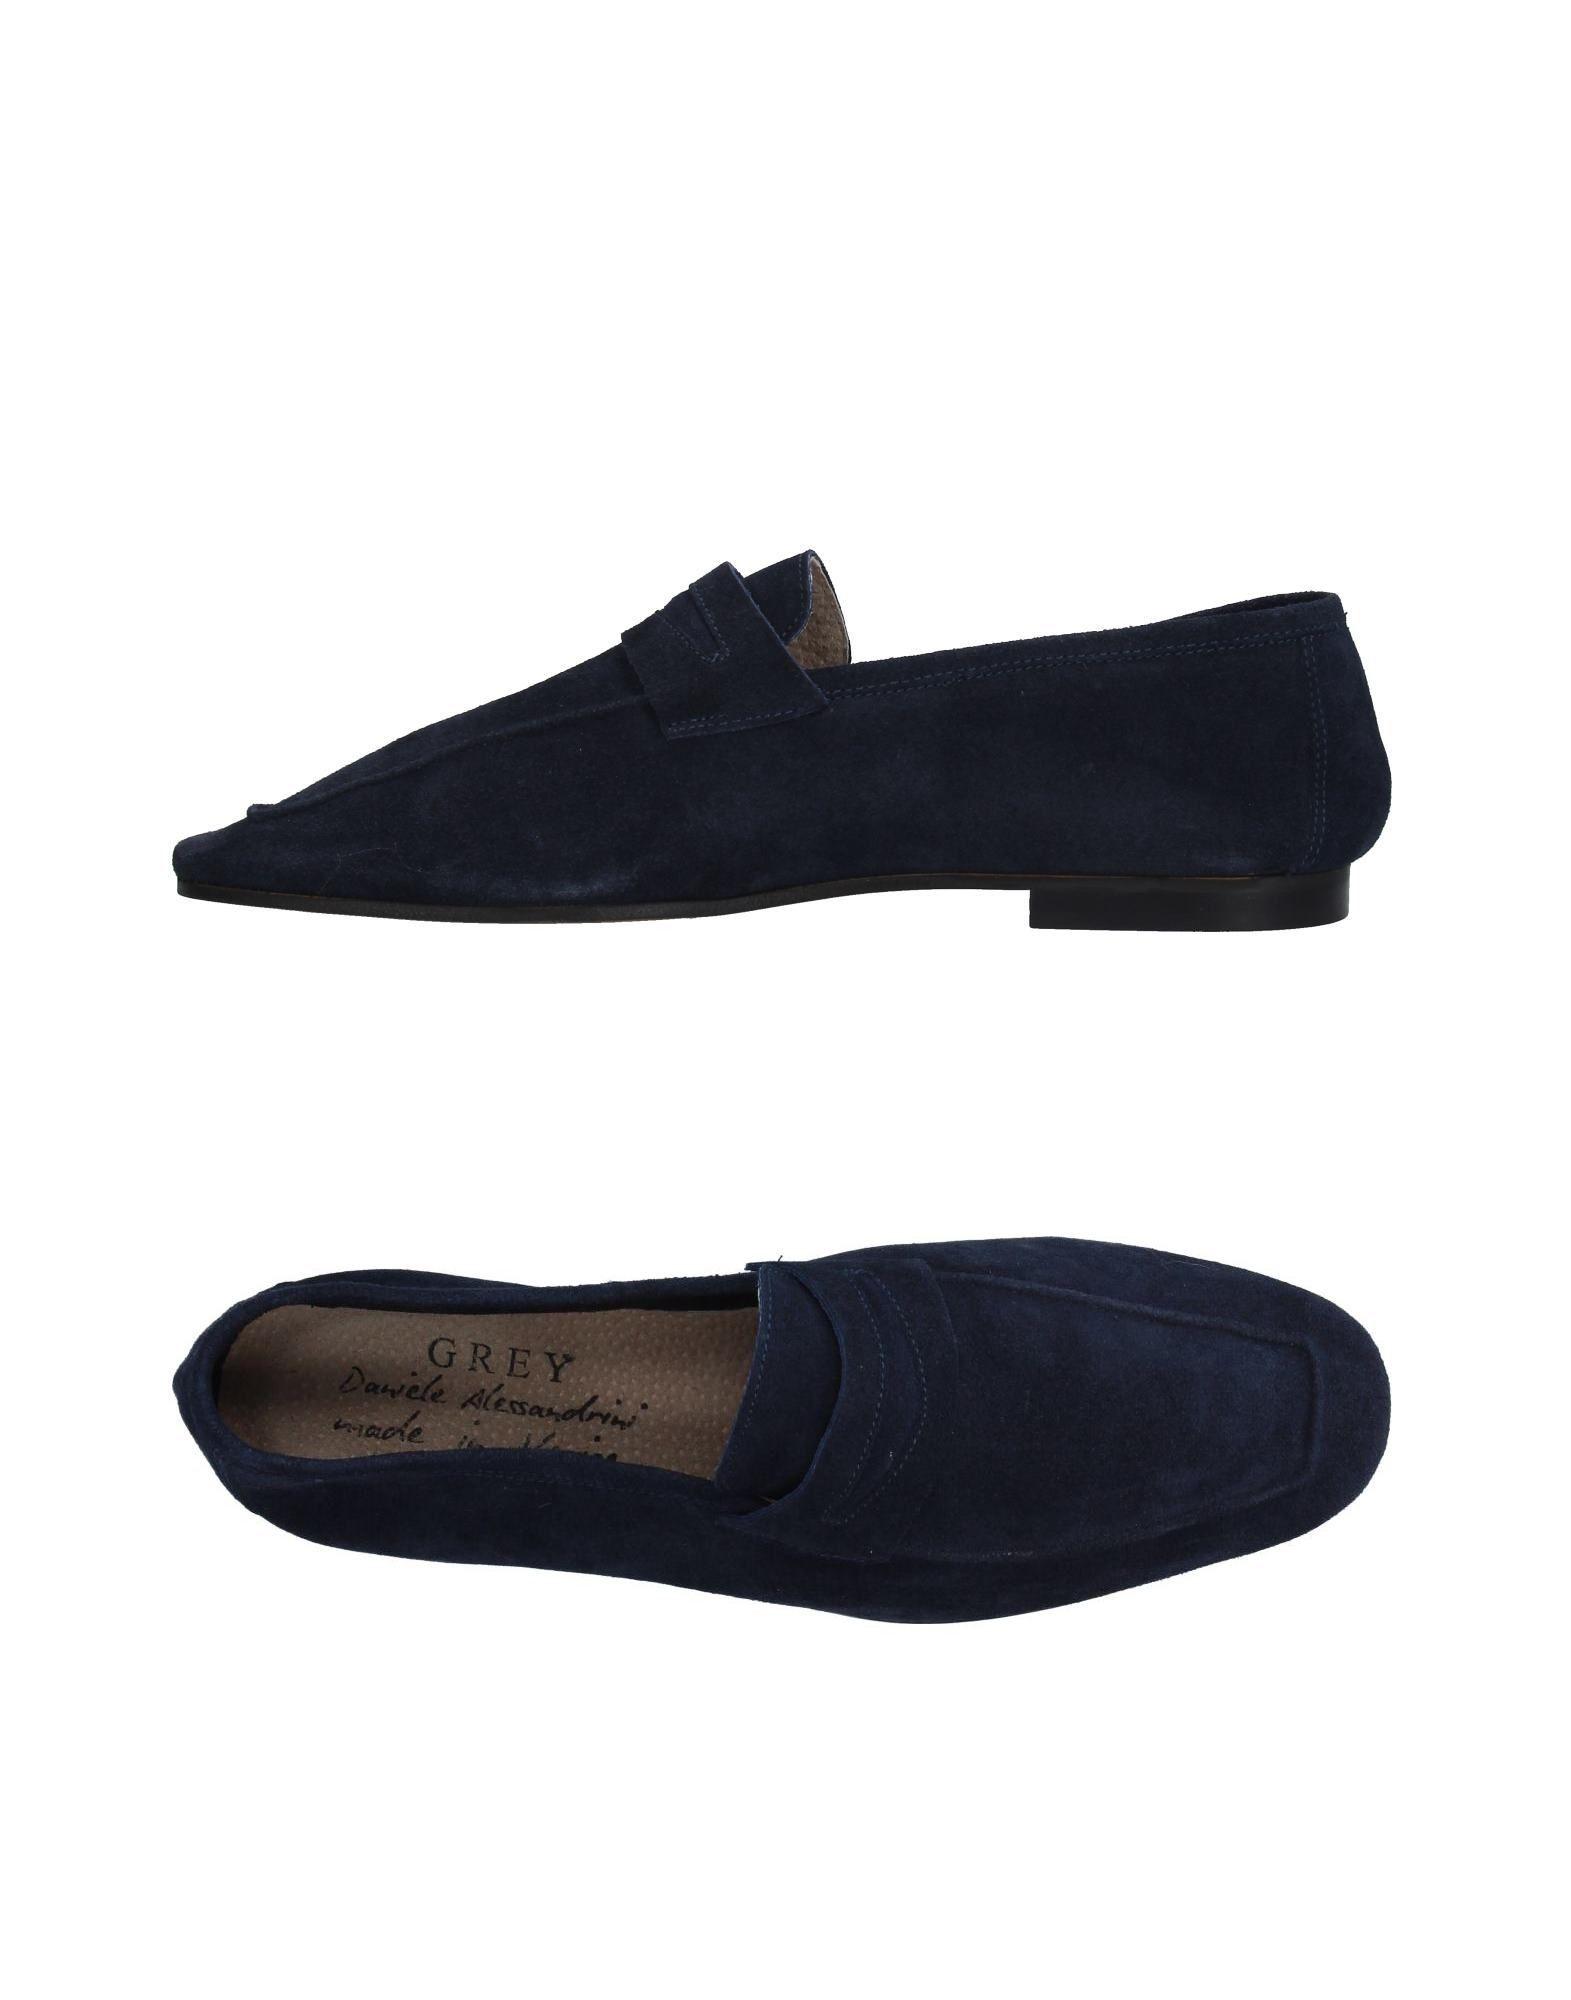 Daniele Alessandrini Mokassins Herren  11215644BM Gute Qualität beliebte Schuhe